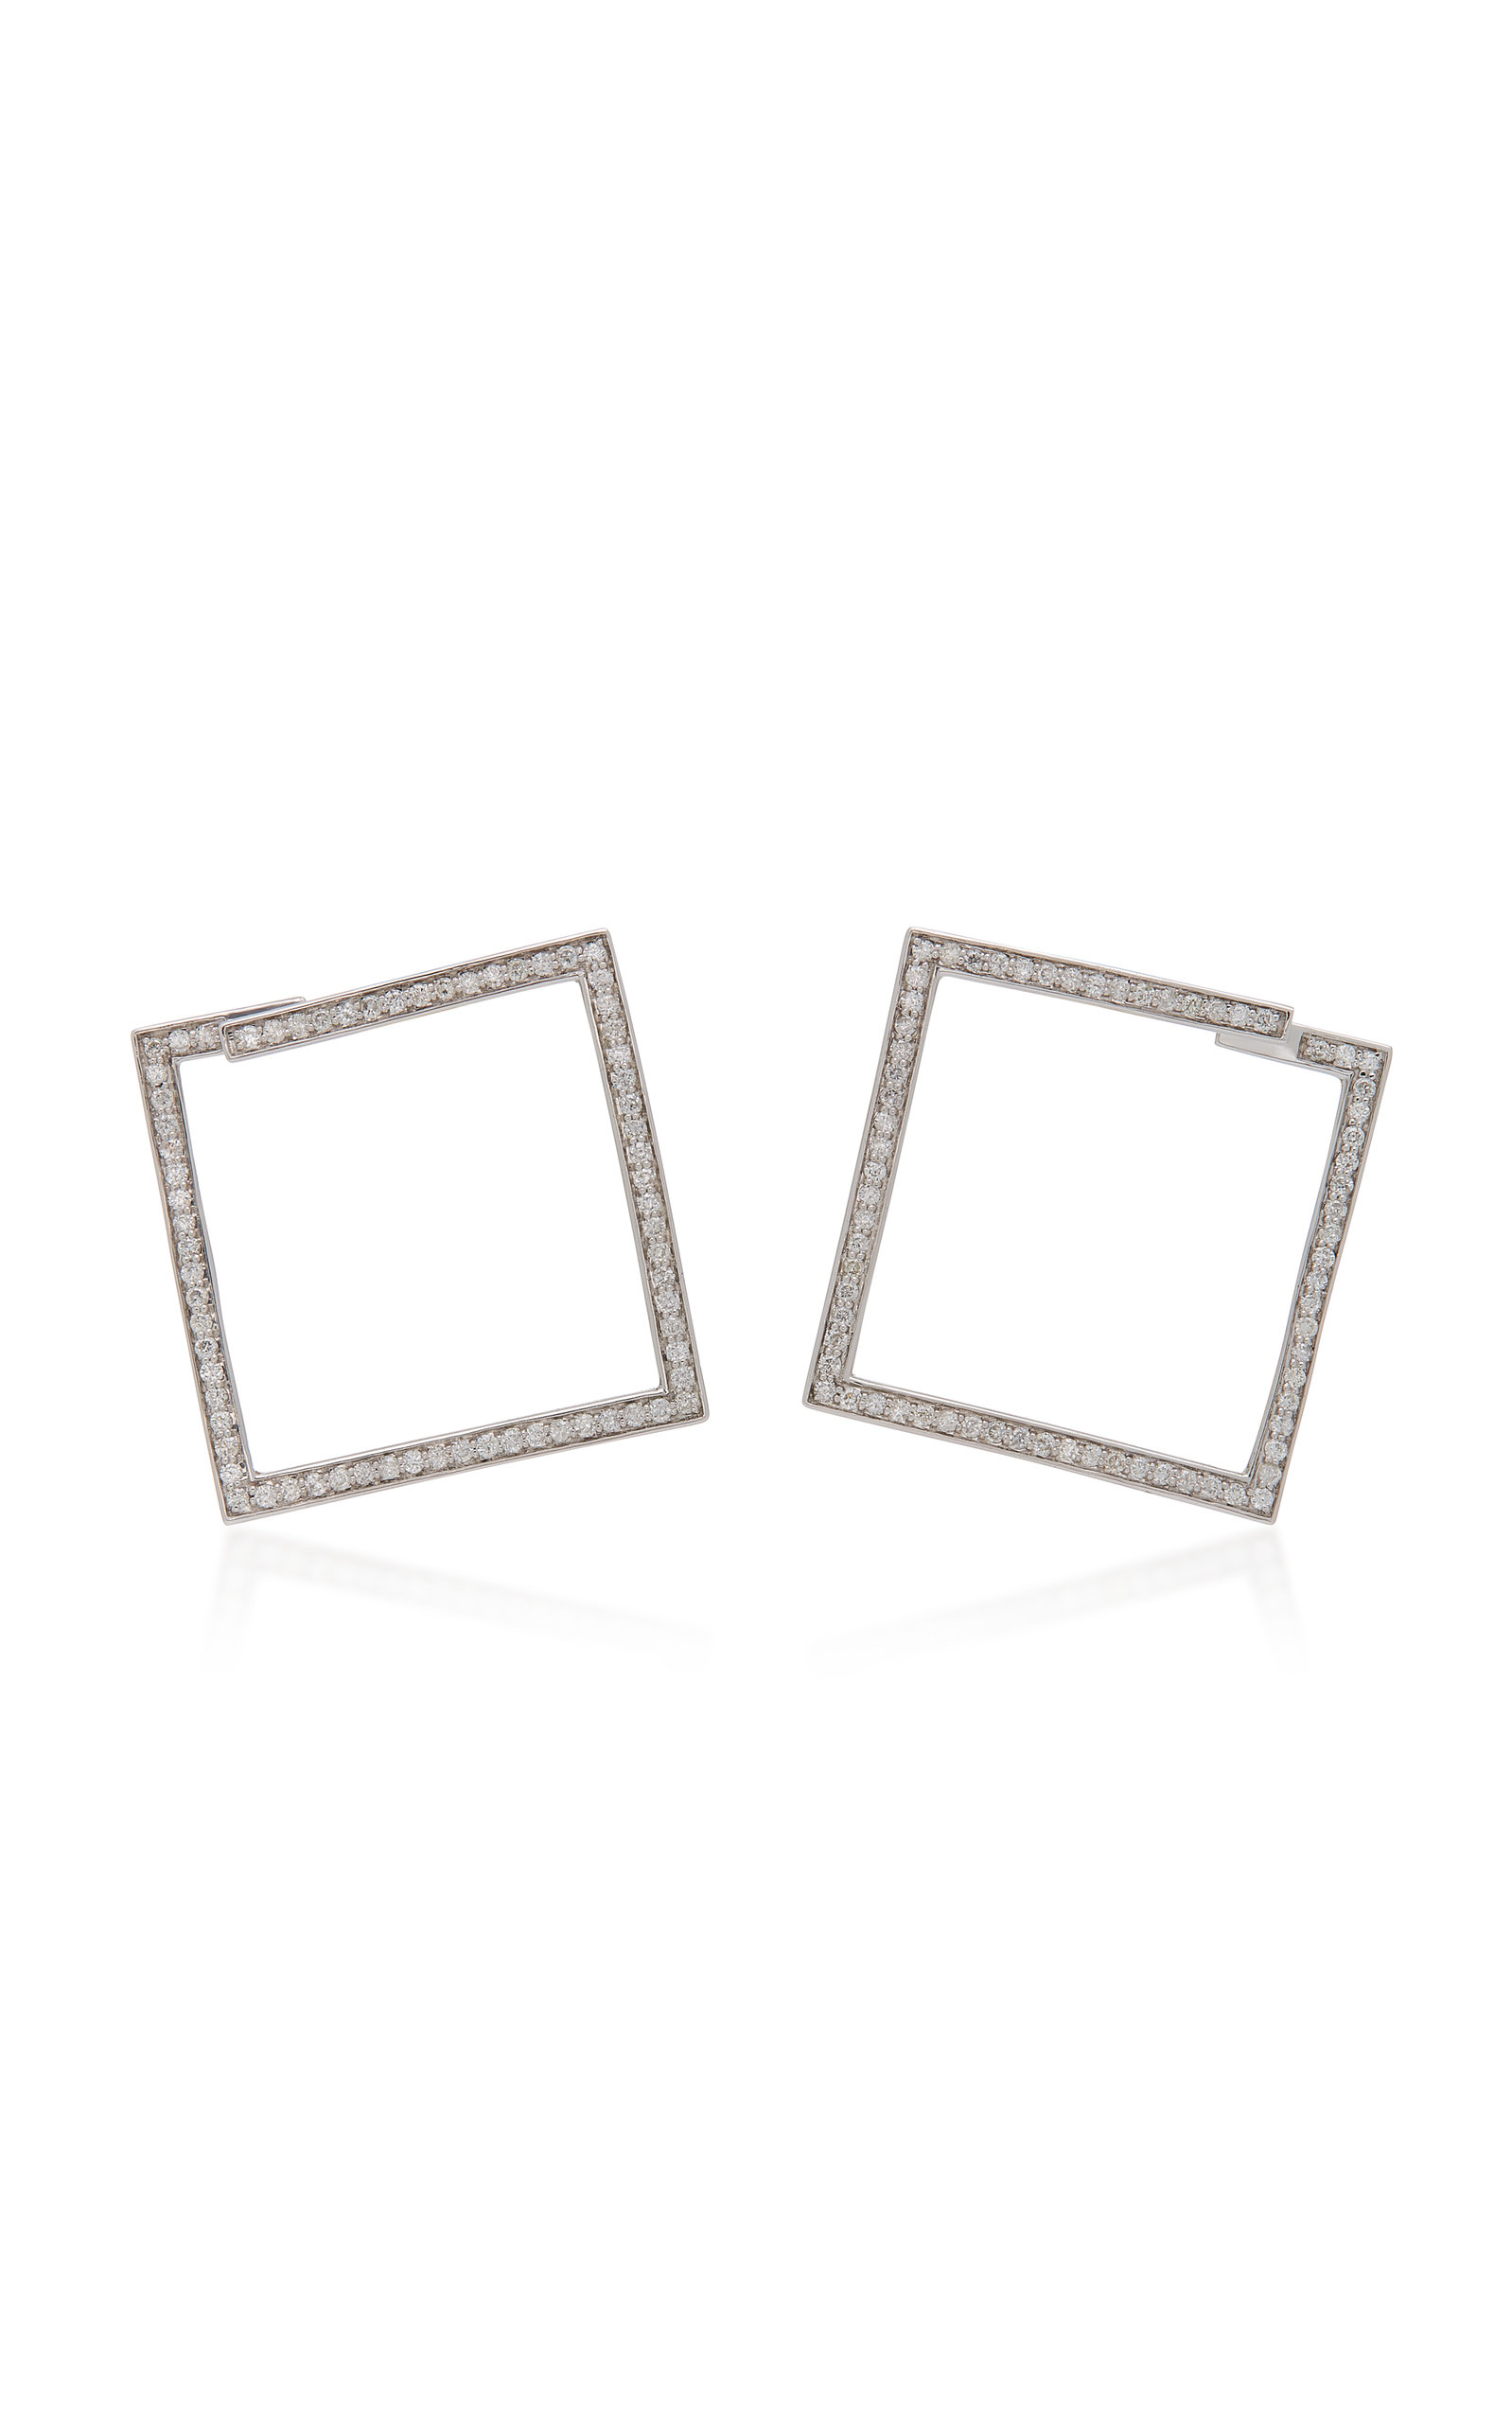 LYNN BAN JEWELRY Rhodium-Plated Silver Diamond Hoop Earrings